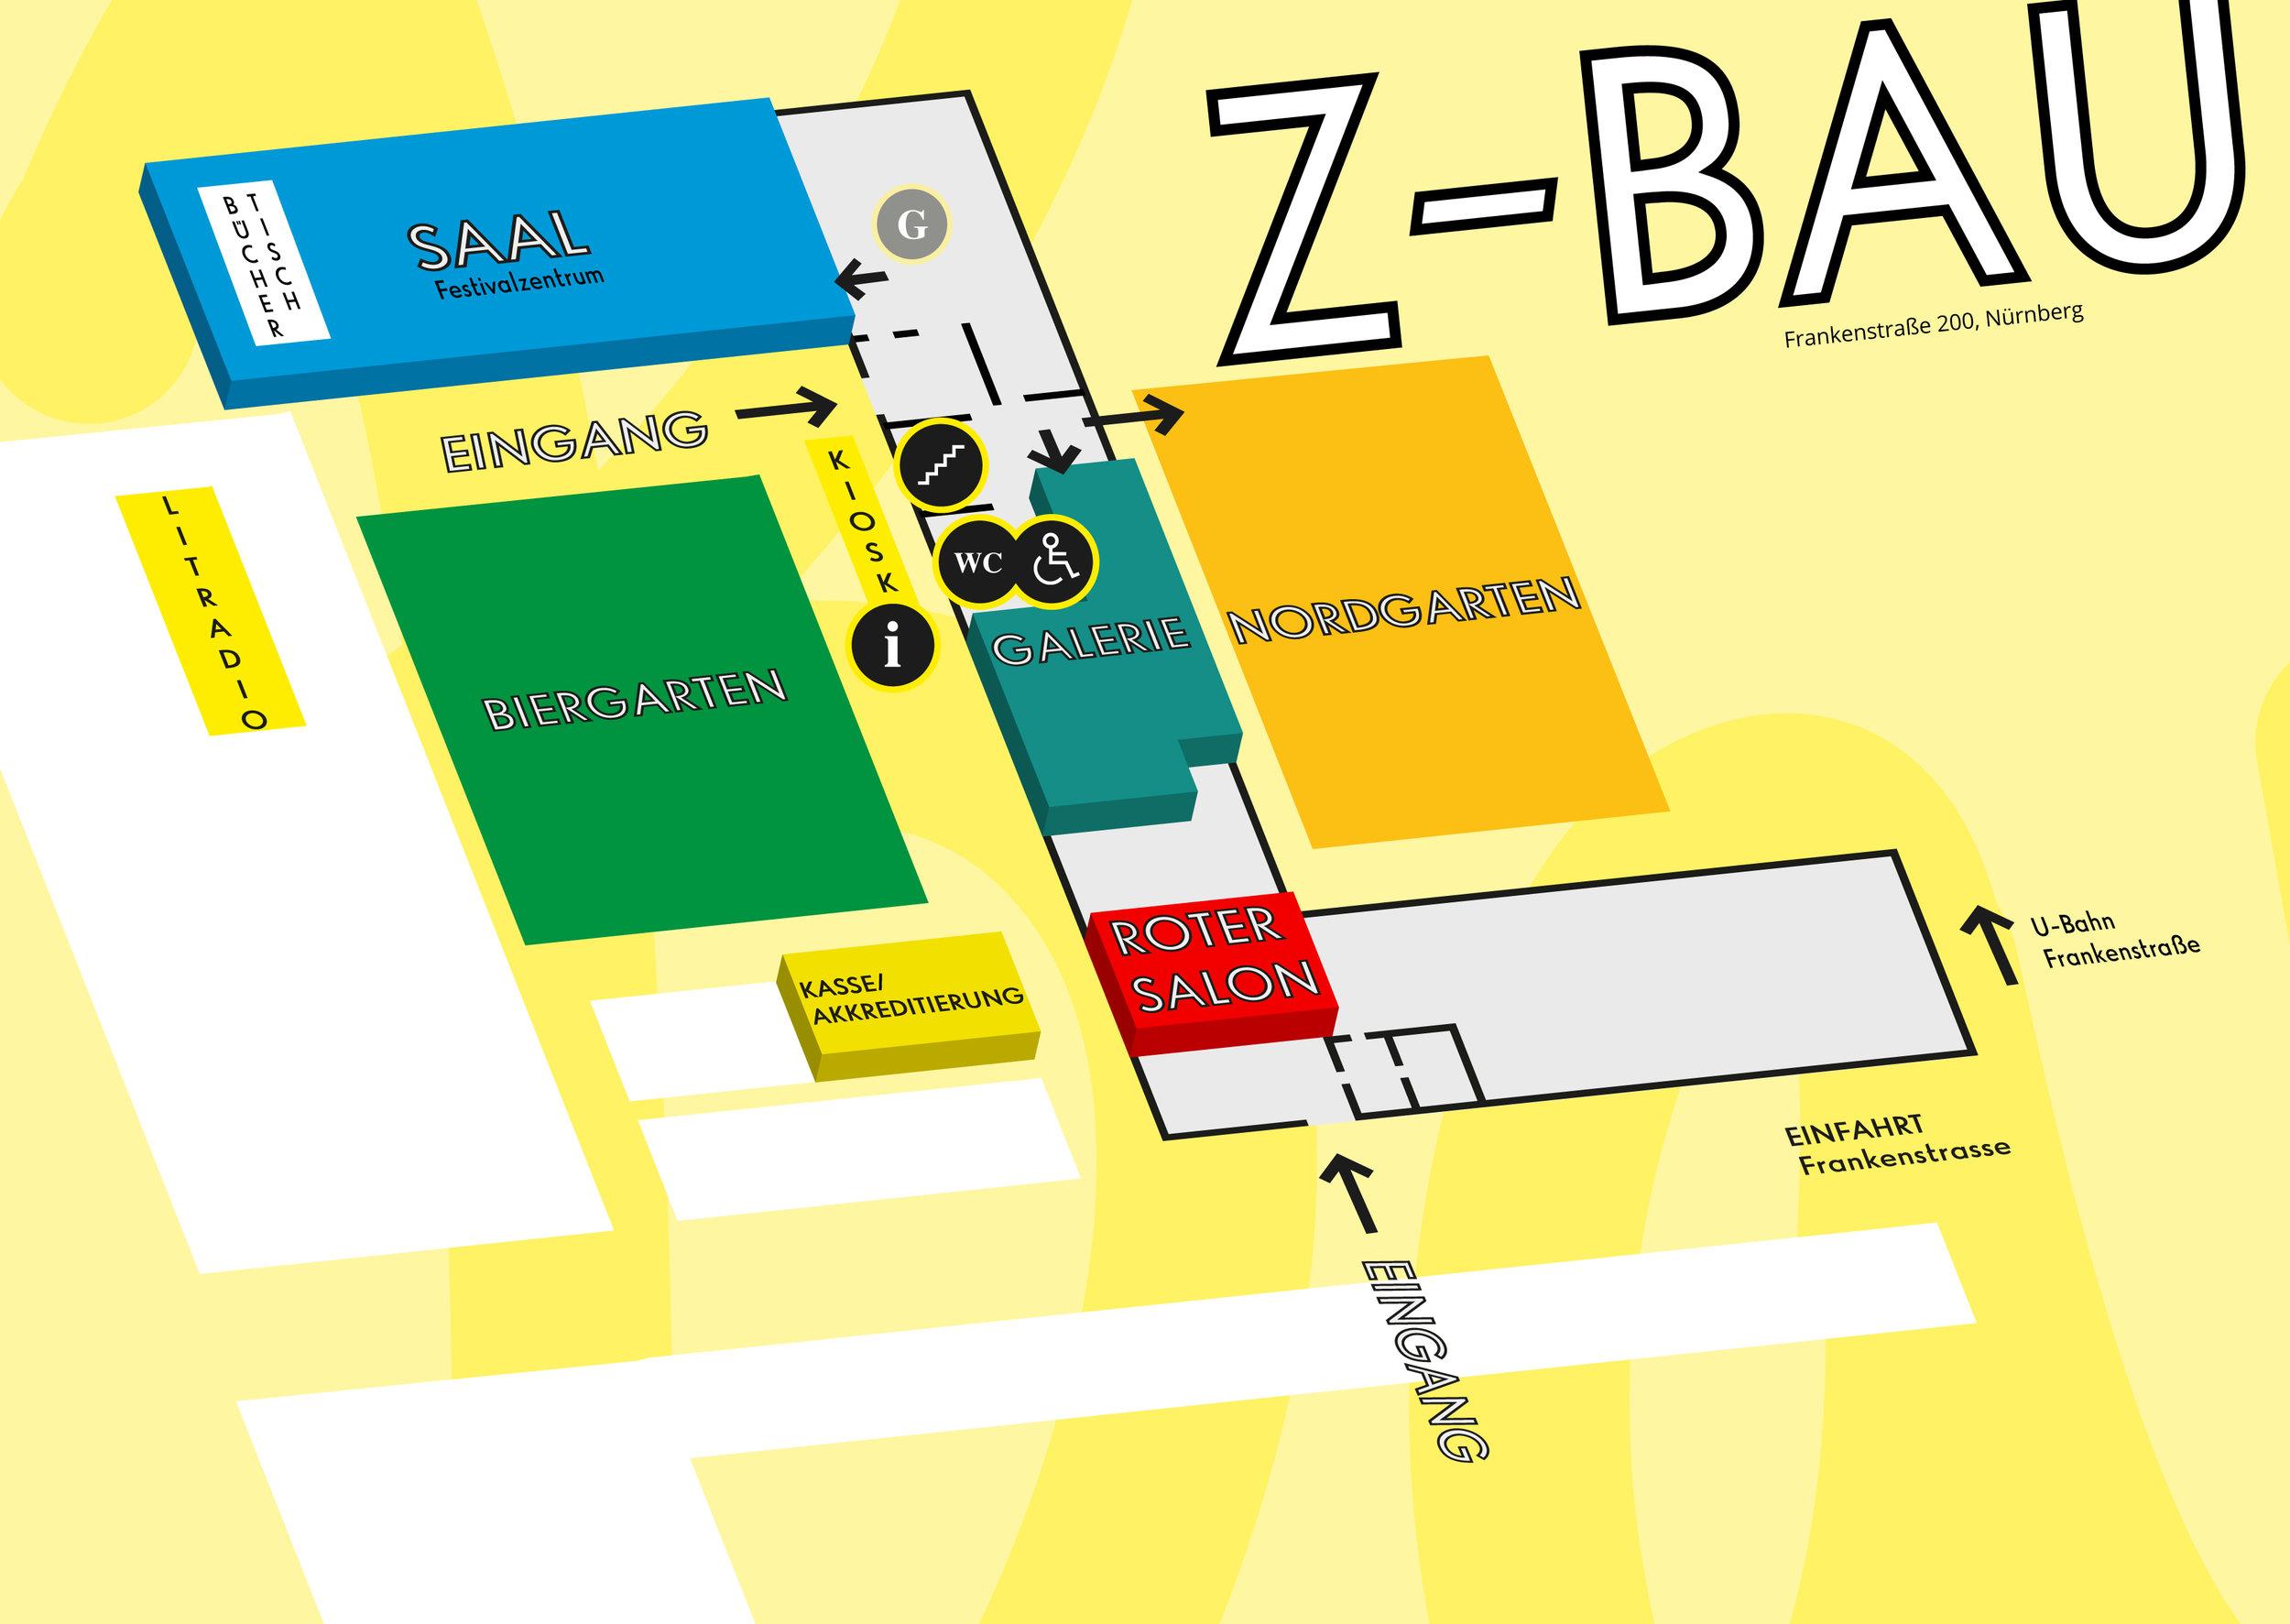 ULF_ZBau-Lageplan Website.jpg